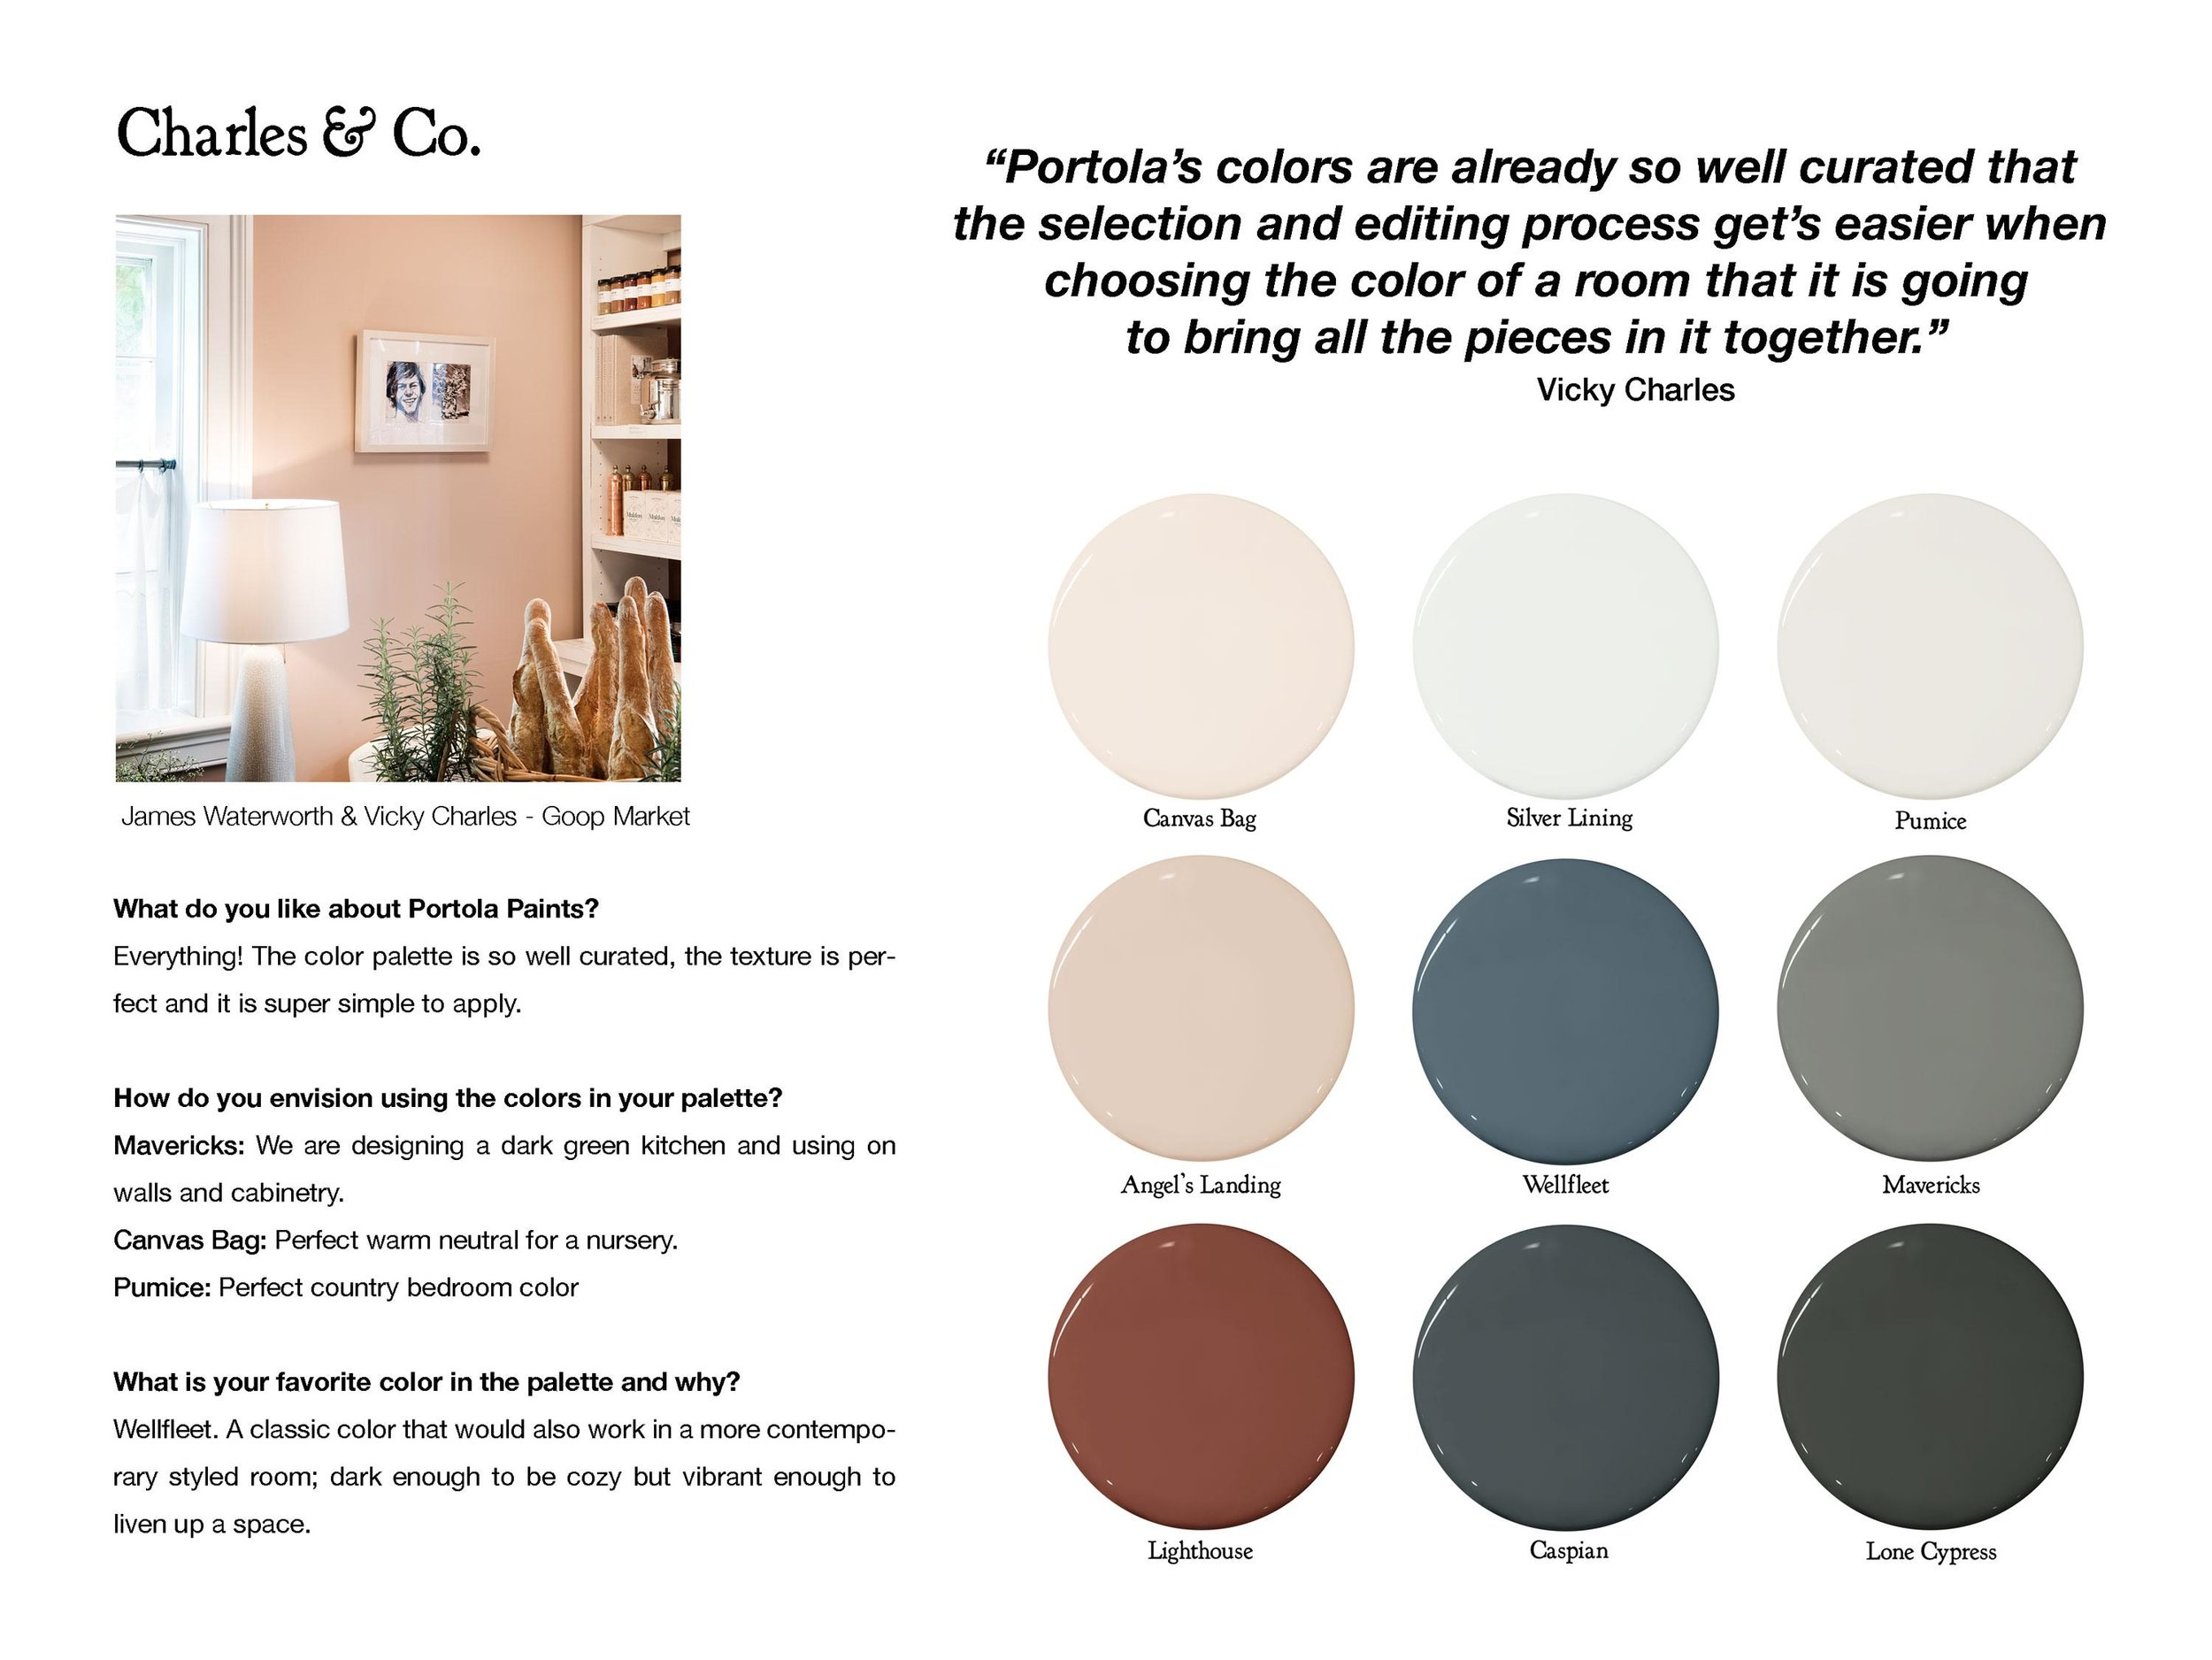 Follow Charles & Co:  charlesandco.com ,  instagram.com/charlesandcodesign   Color Picks:  Canvas Bag ,  Silver Lining ,  Pumice ,  Angel's Landing ,  Wellfleet ,  Mavericks ,  Lighthouse ,  Caspian ,  Lone Cypress